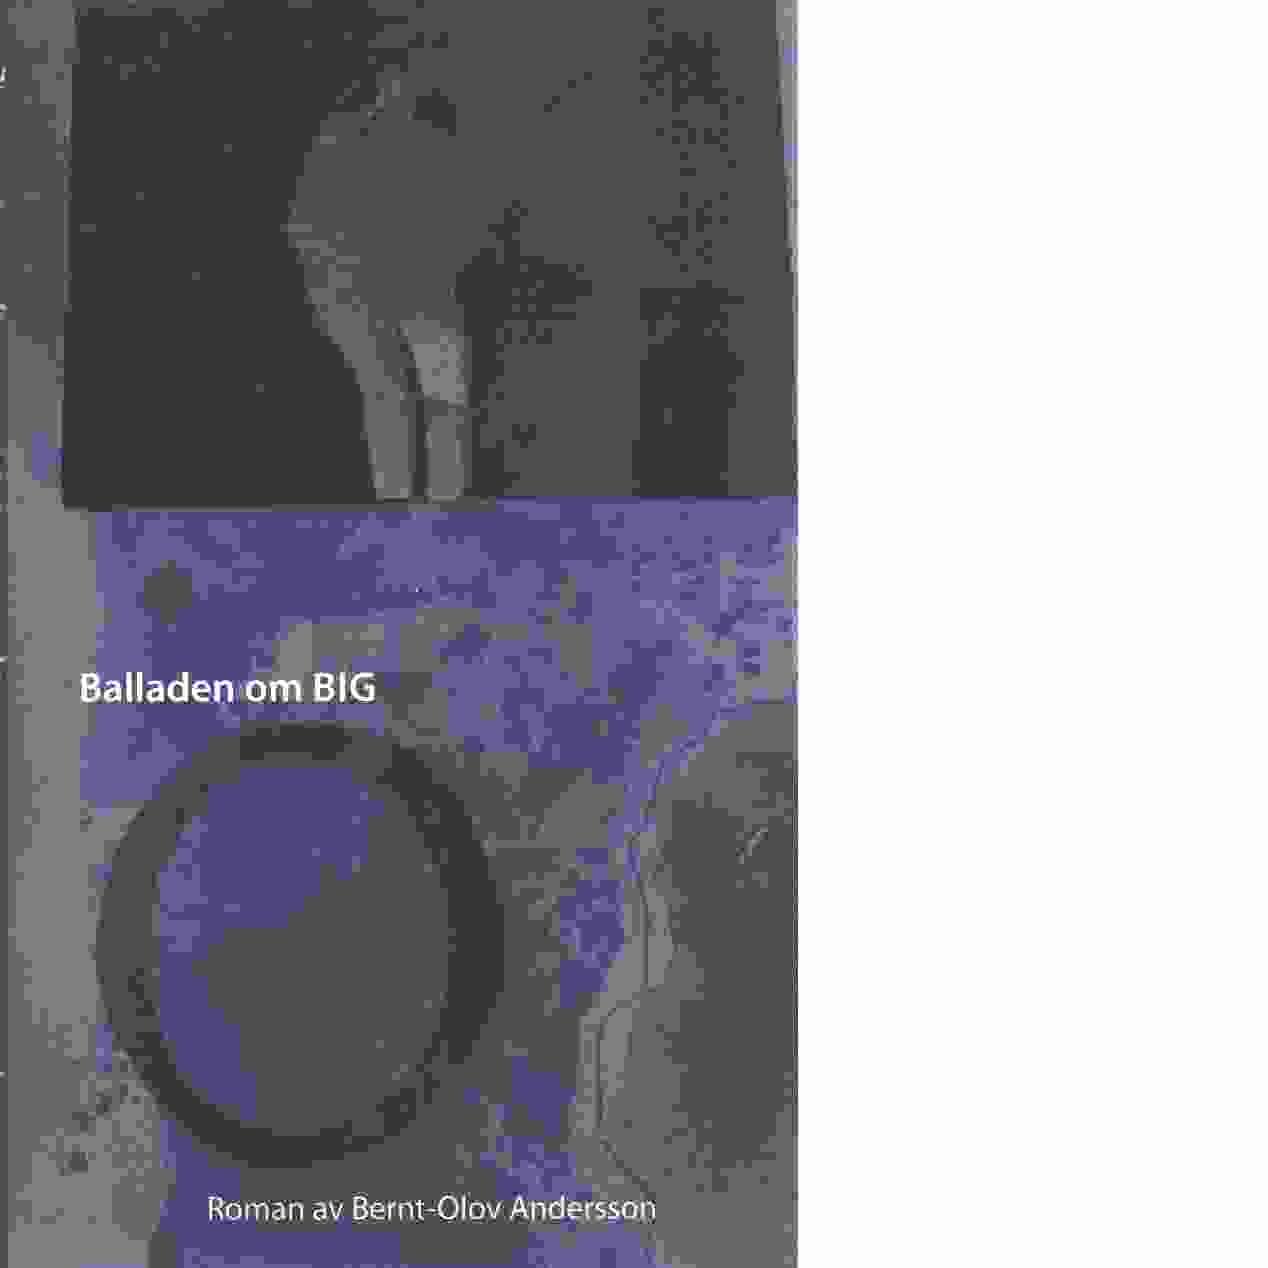 Balladen om big O - Andersson, Bernt-Olov